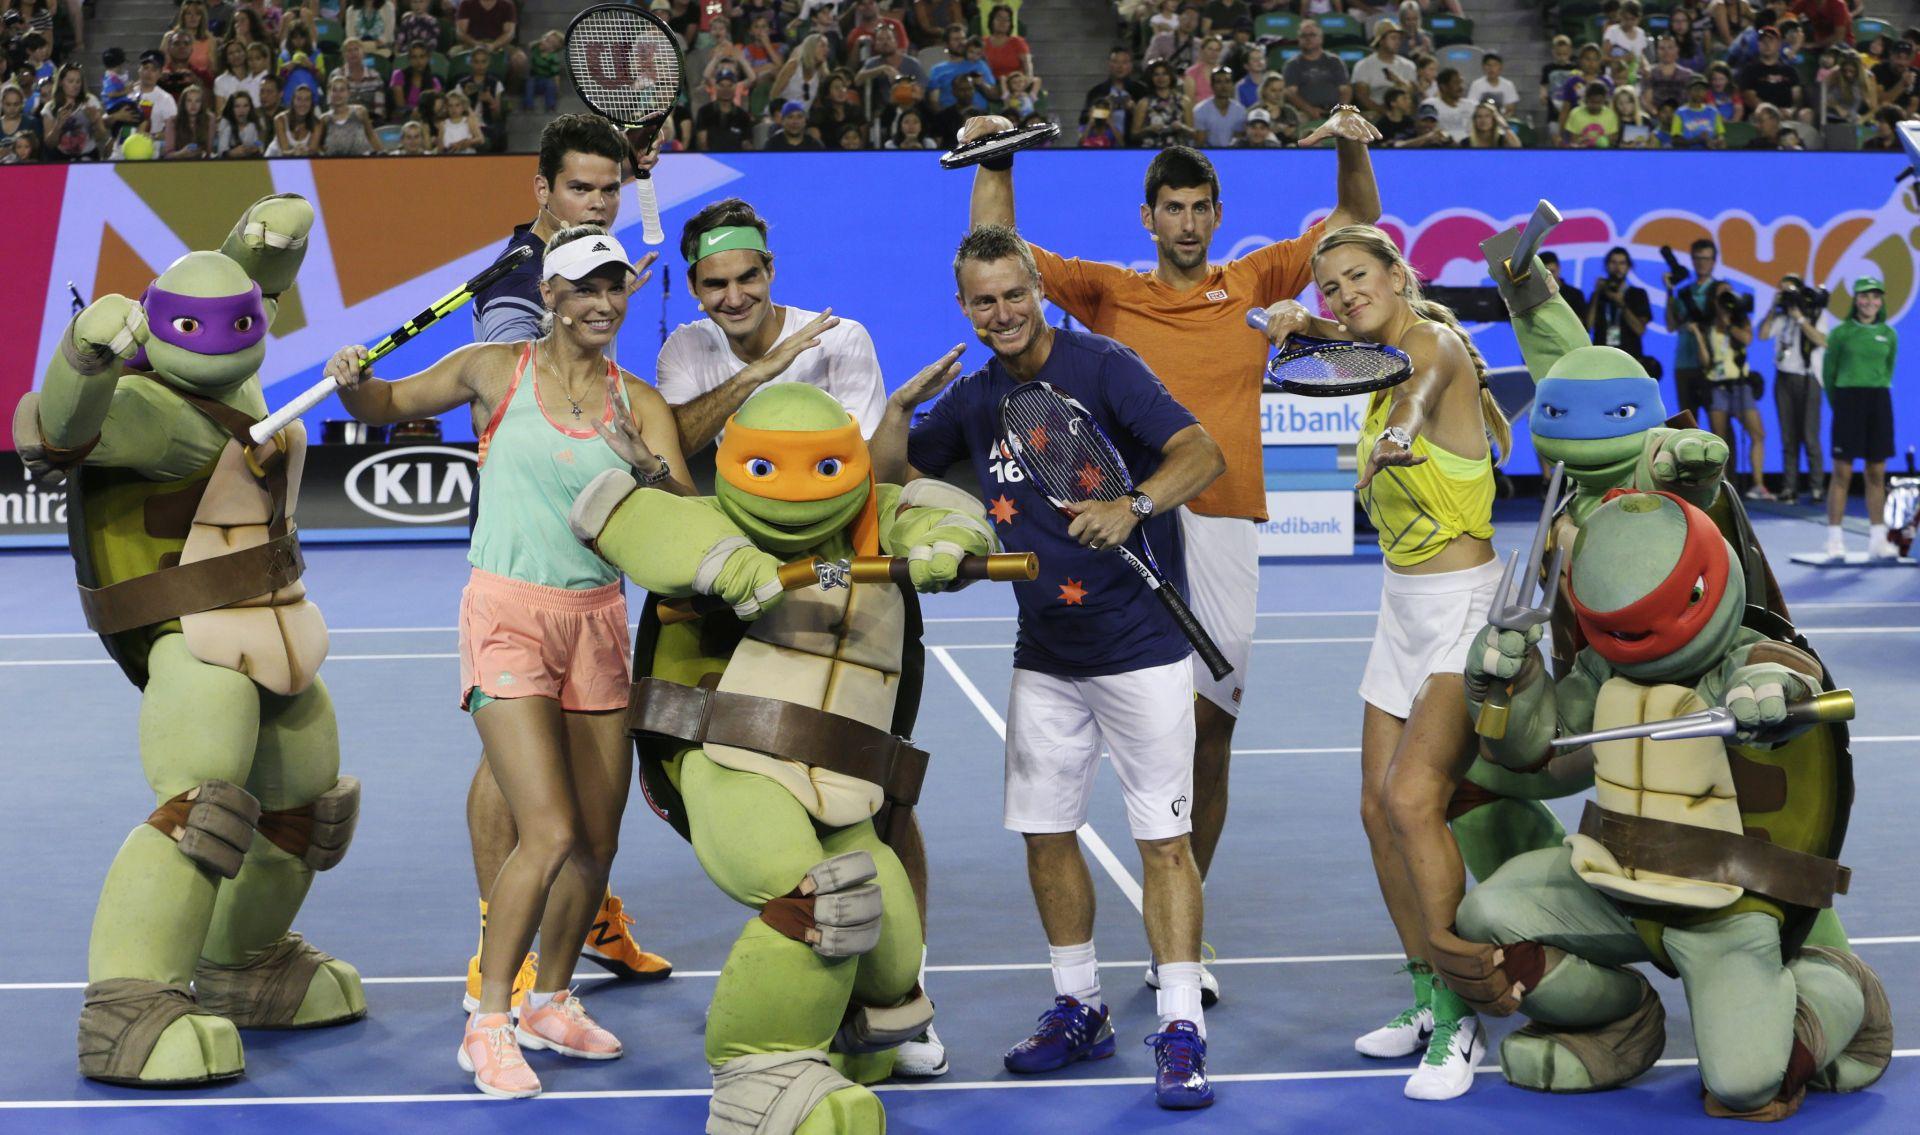 VIDEO: WHAT'S MY NAME? Organizatori Australian opena 'prekrstili' najboljeg tenisača svijeta